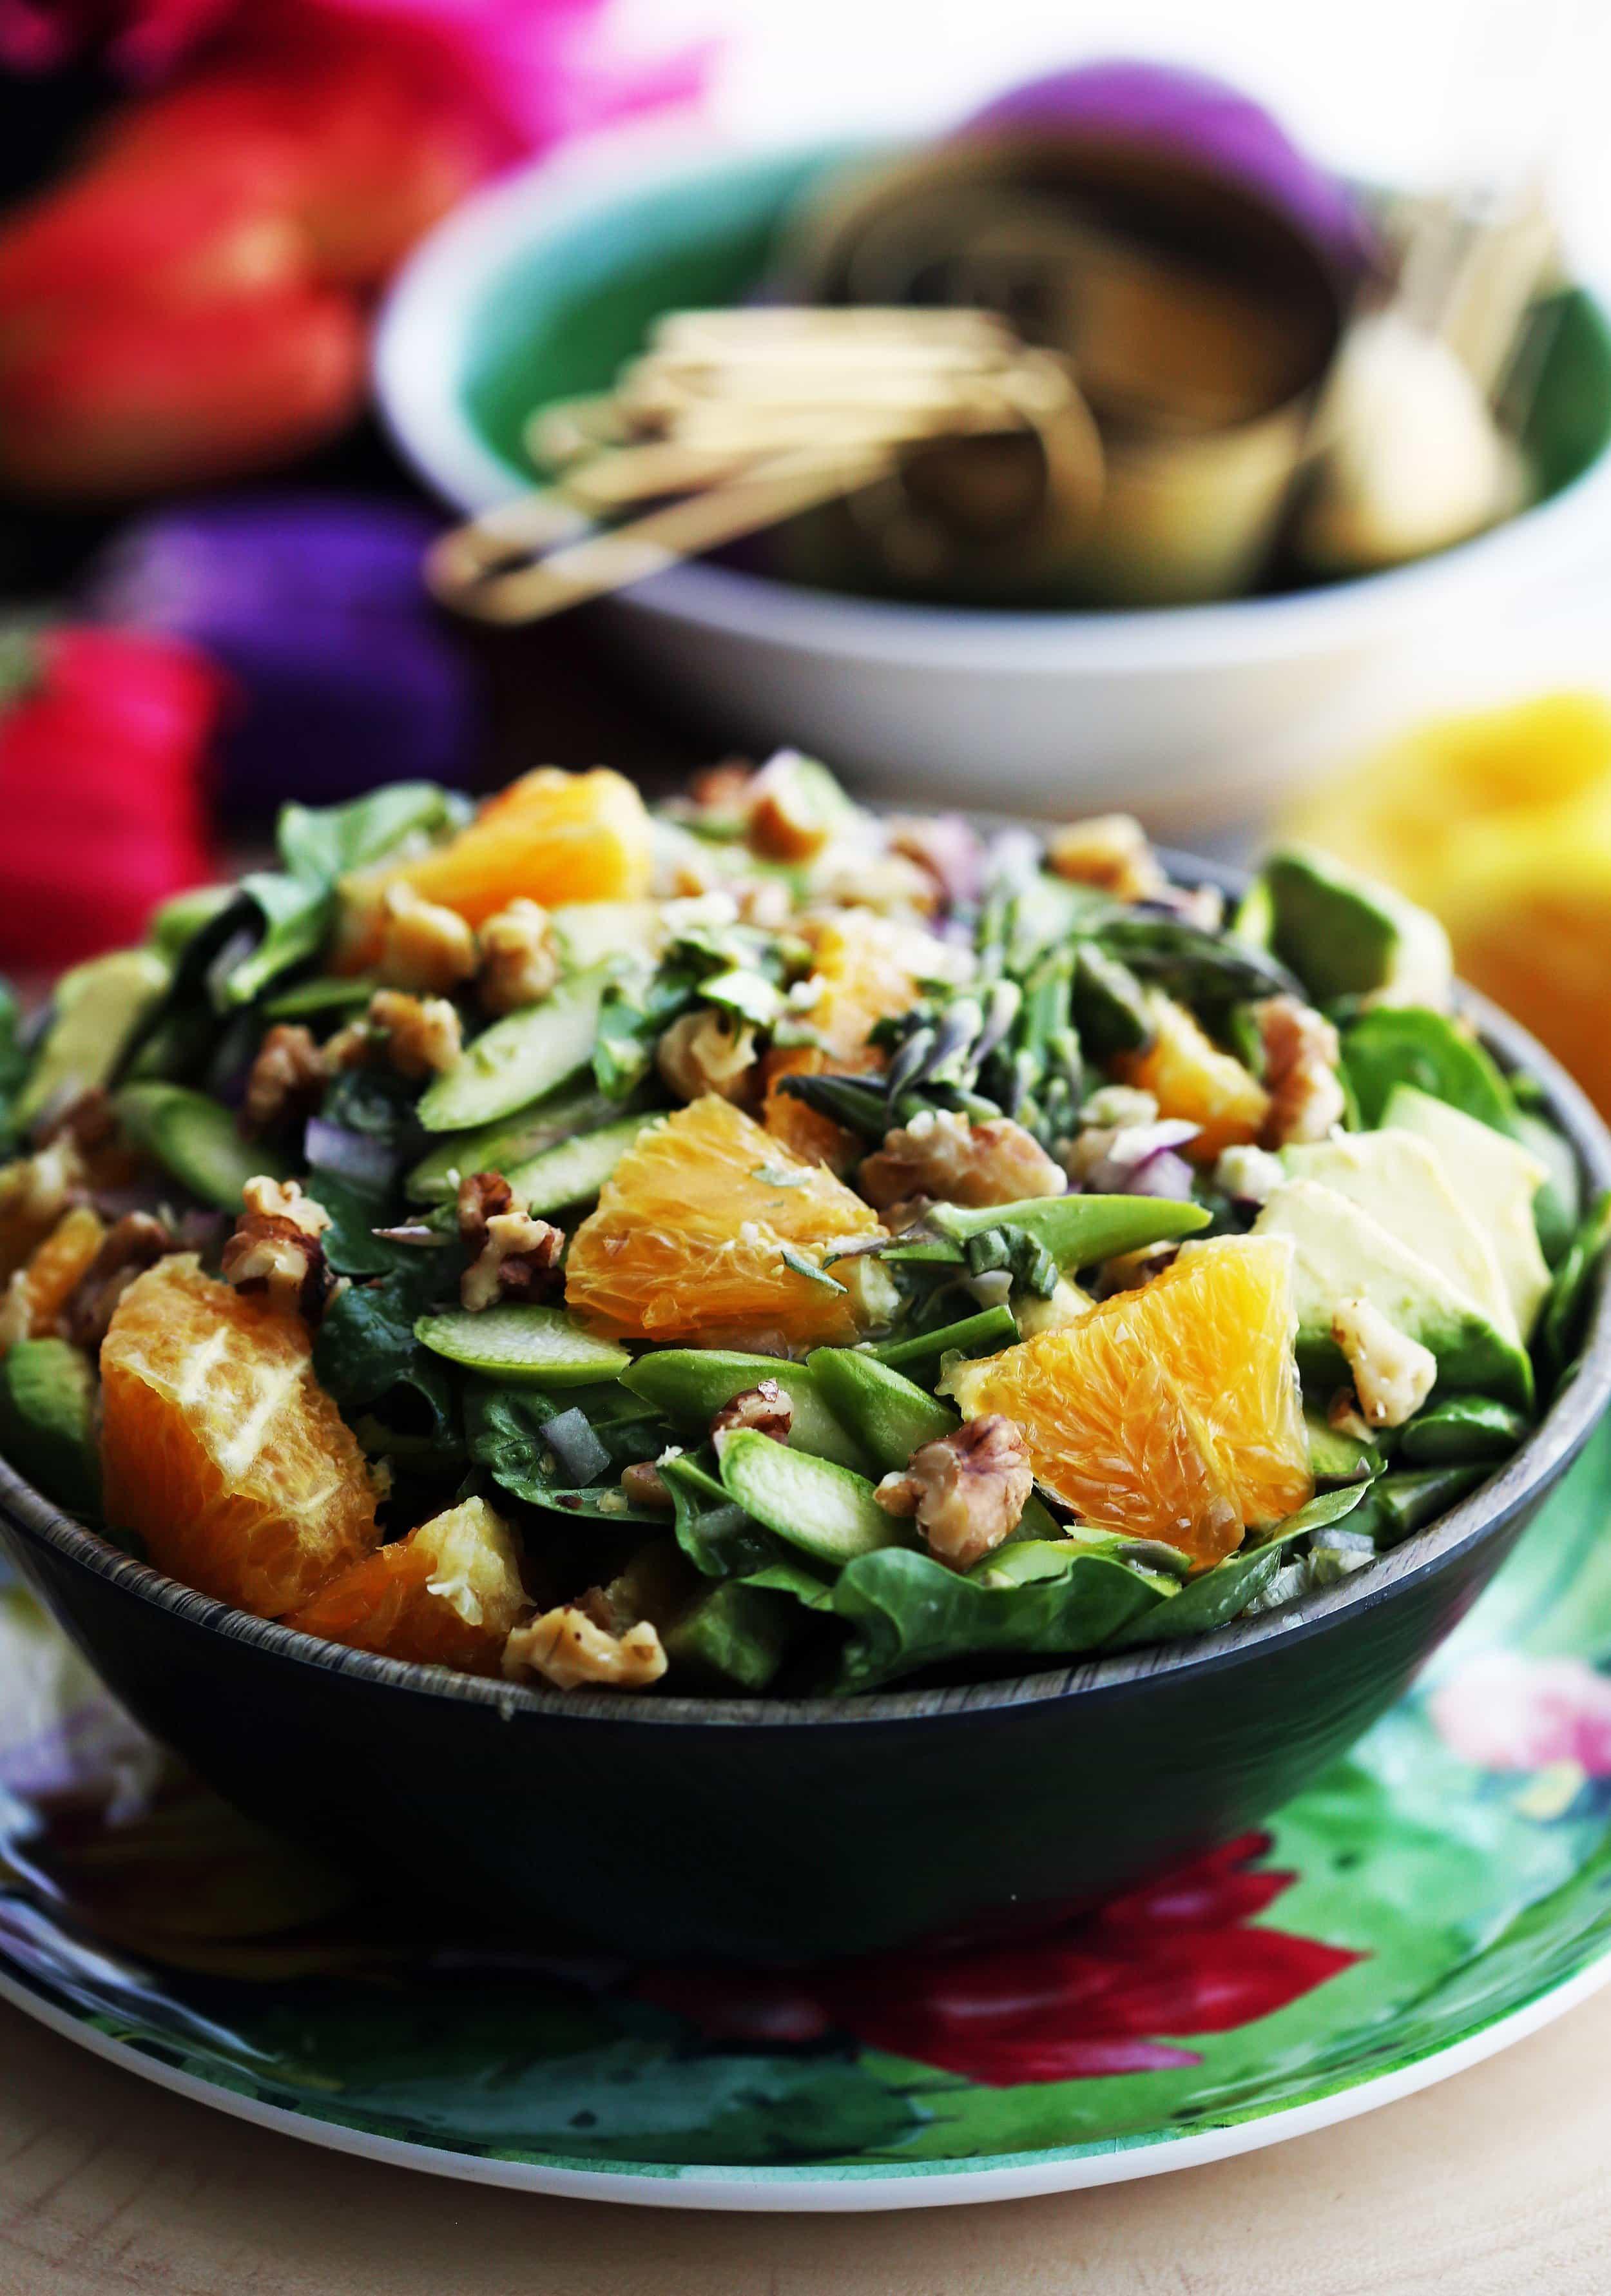 A closeup view of a bowl of Asparagus Orange Spinach Salad with Basil Lemon Vinaigrette